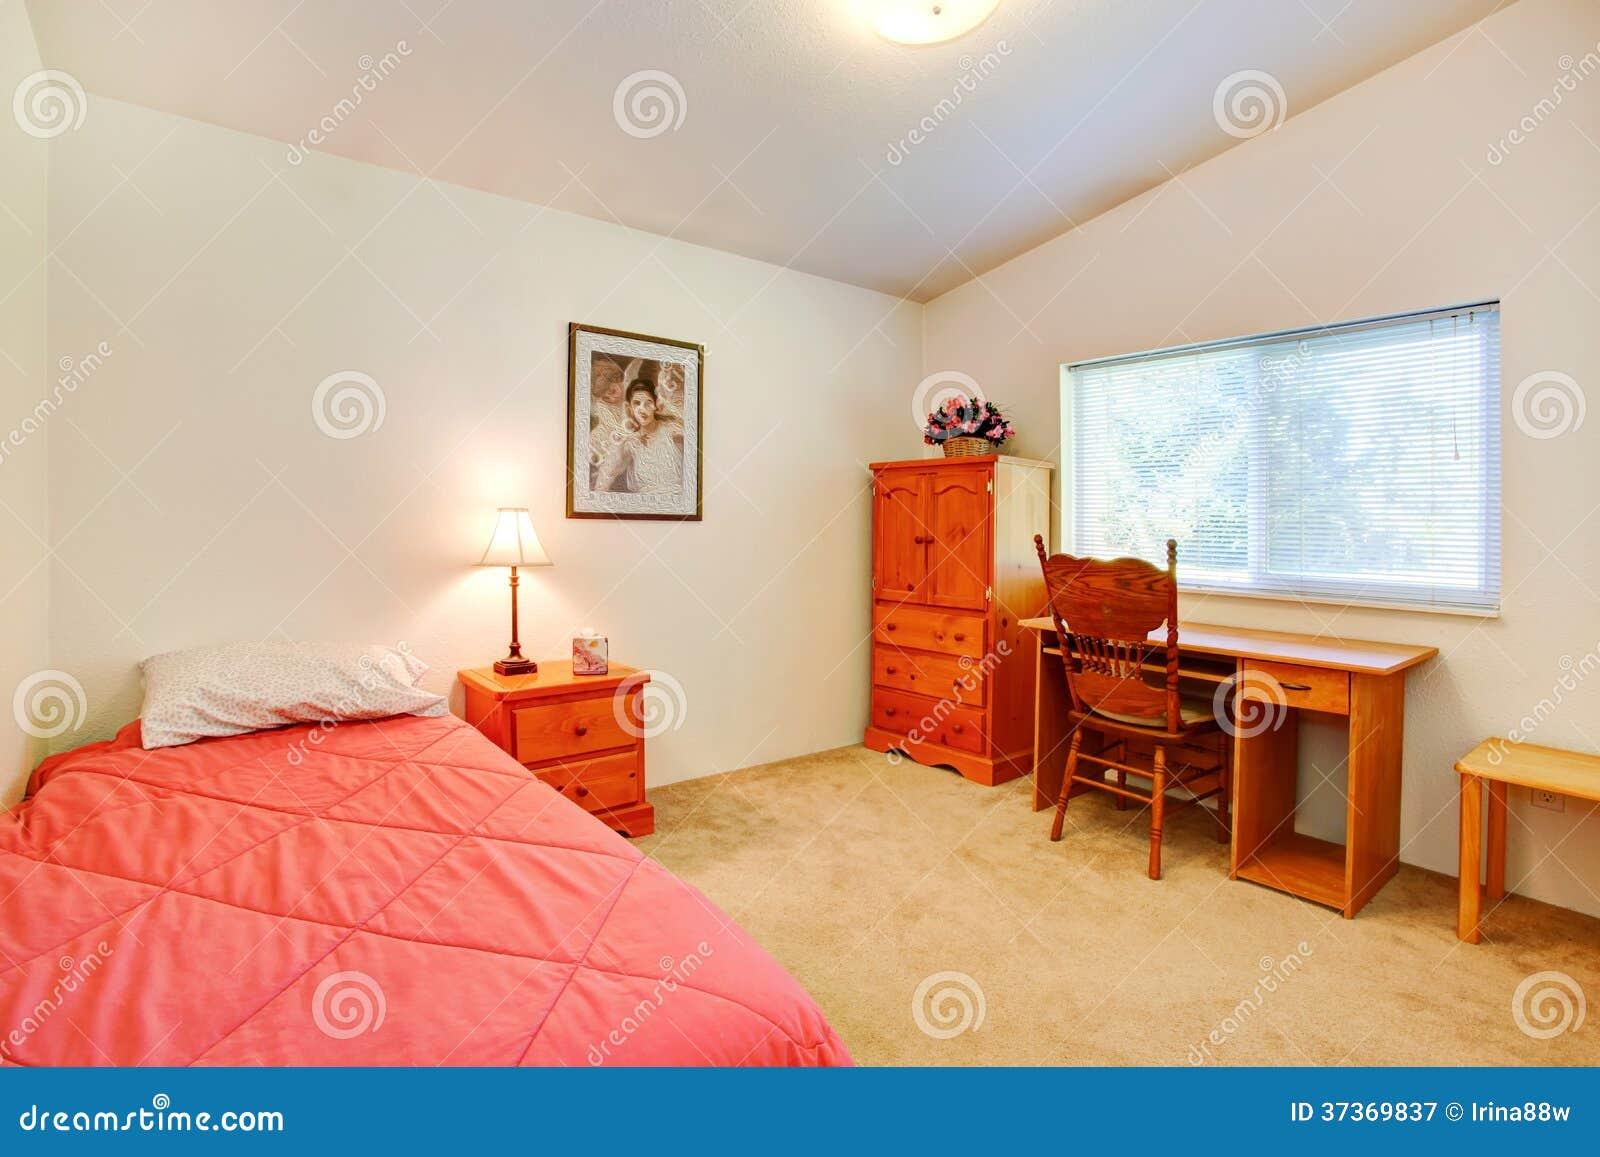 Farmhouse Cozy Bedroom Royalty Free Stock Photography Image 37369837